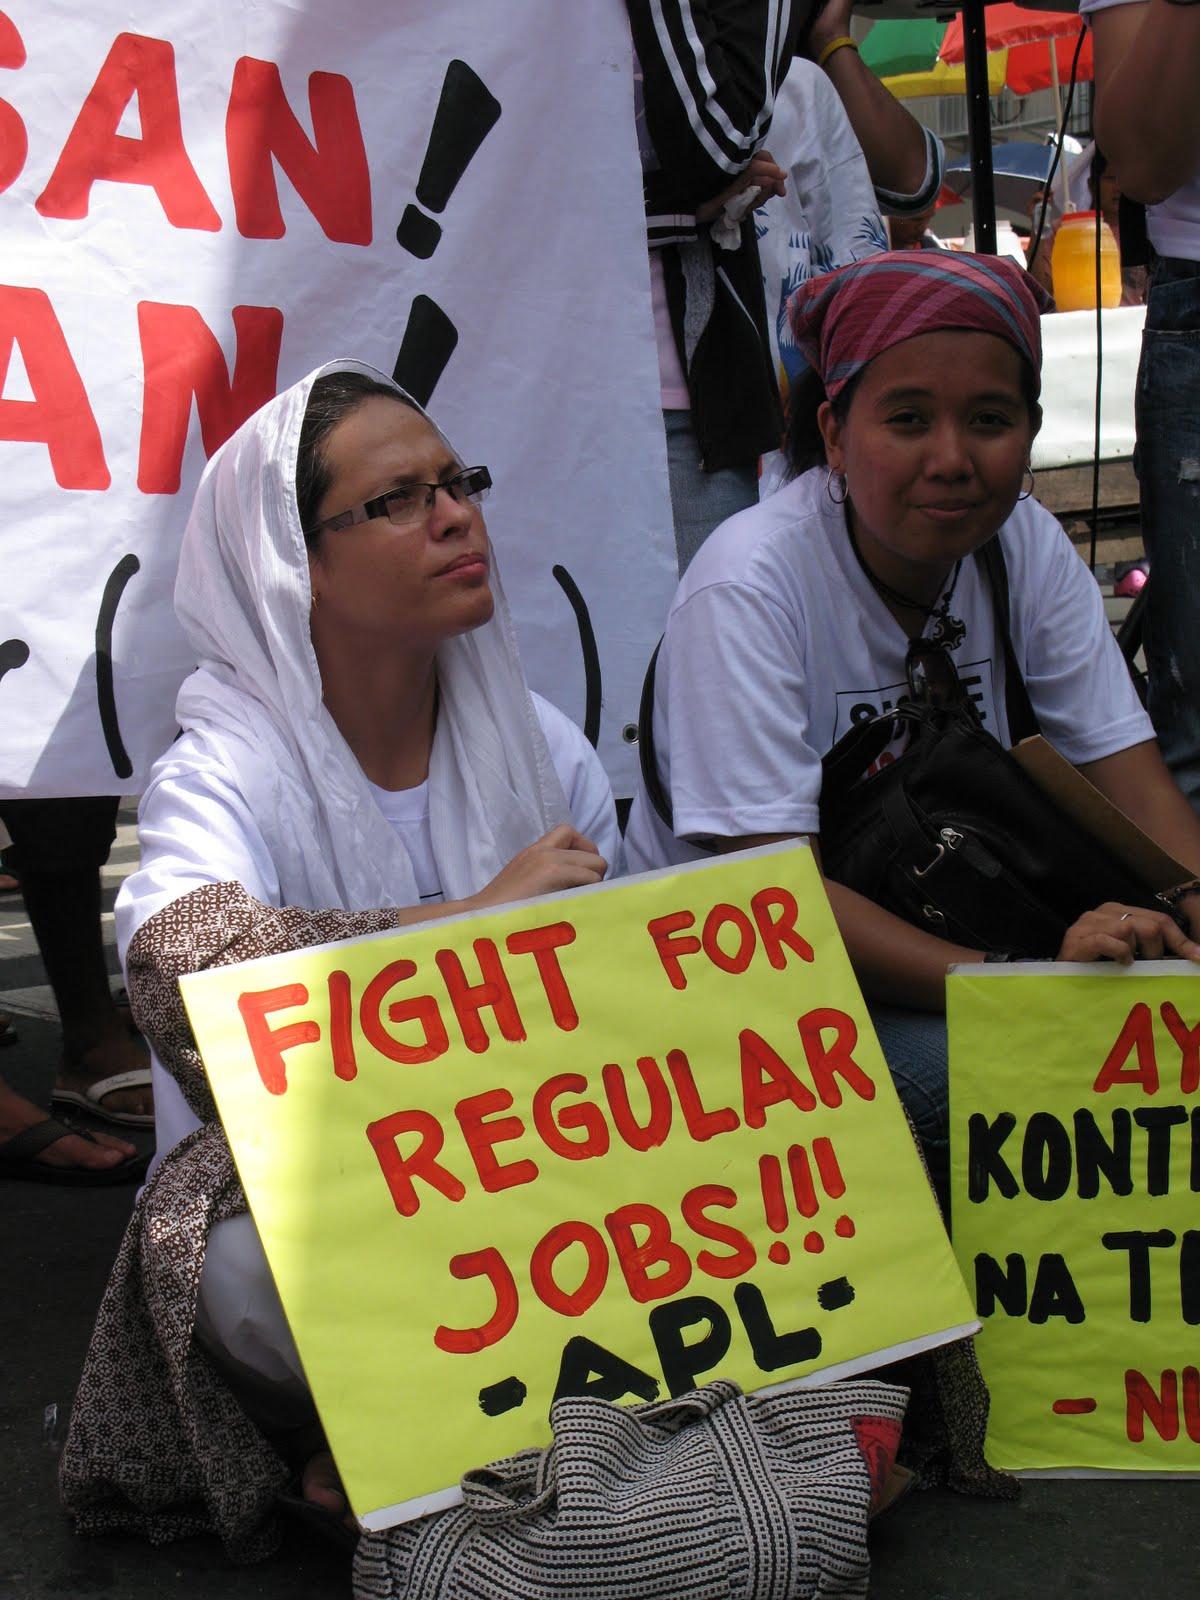 Rord aung san suu kyi motte protesterande munkar